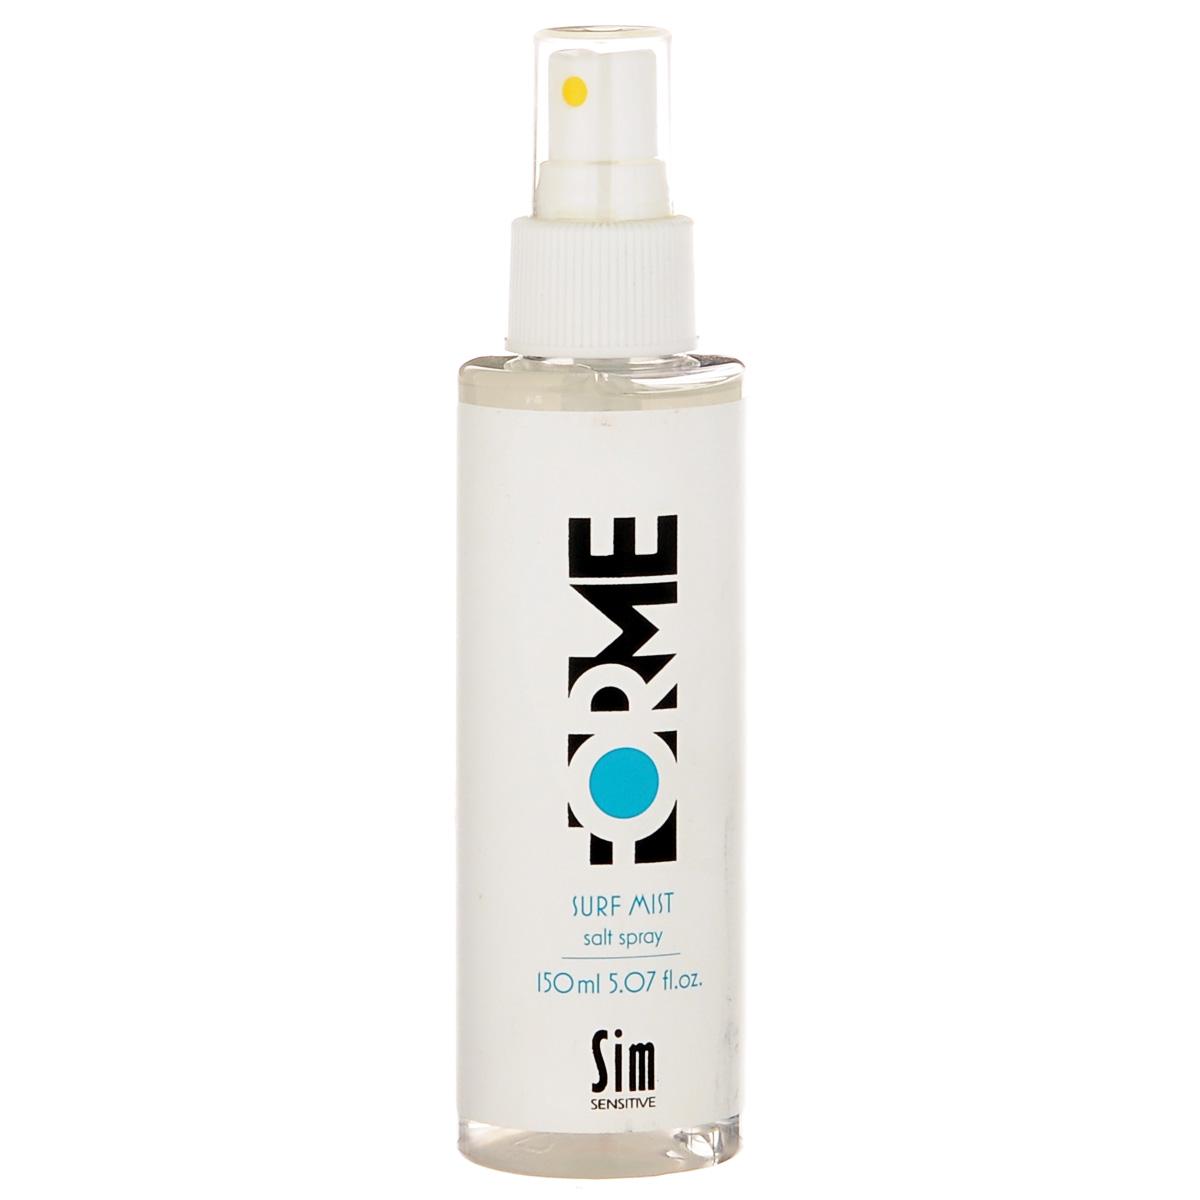 SIM SENSITIVE Cпрей с морской солью FORME Surf Mist Salt Spray 150мл (Sim Sensitive)